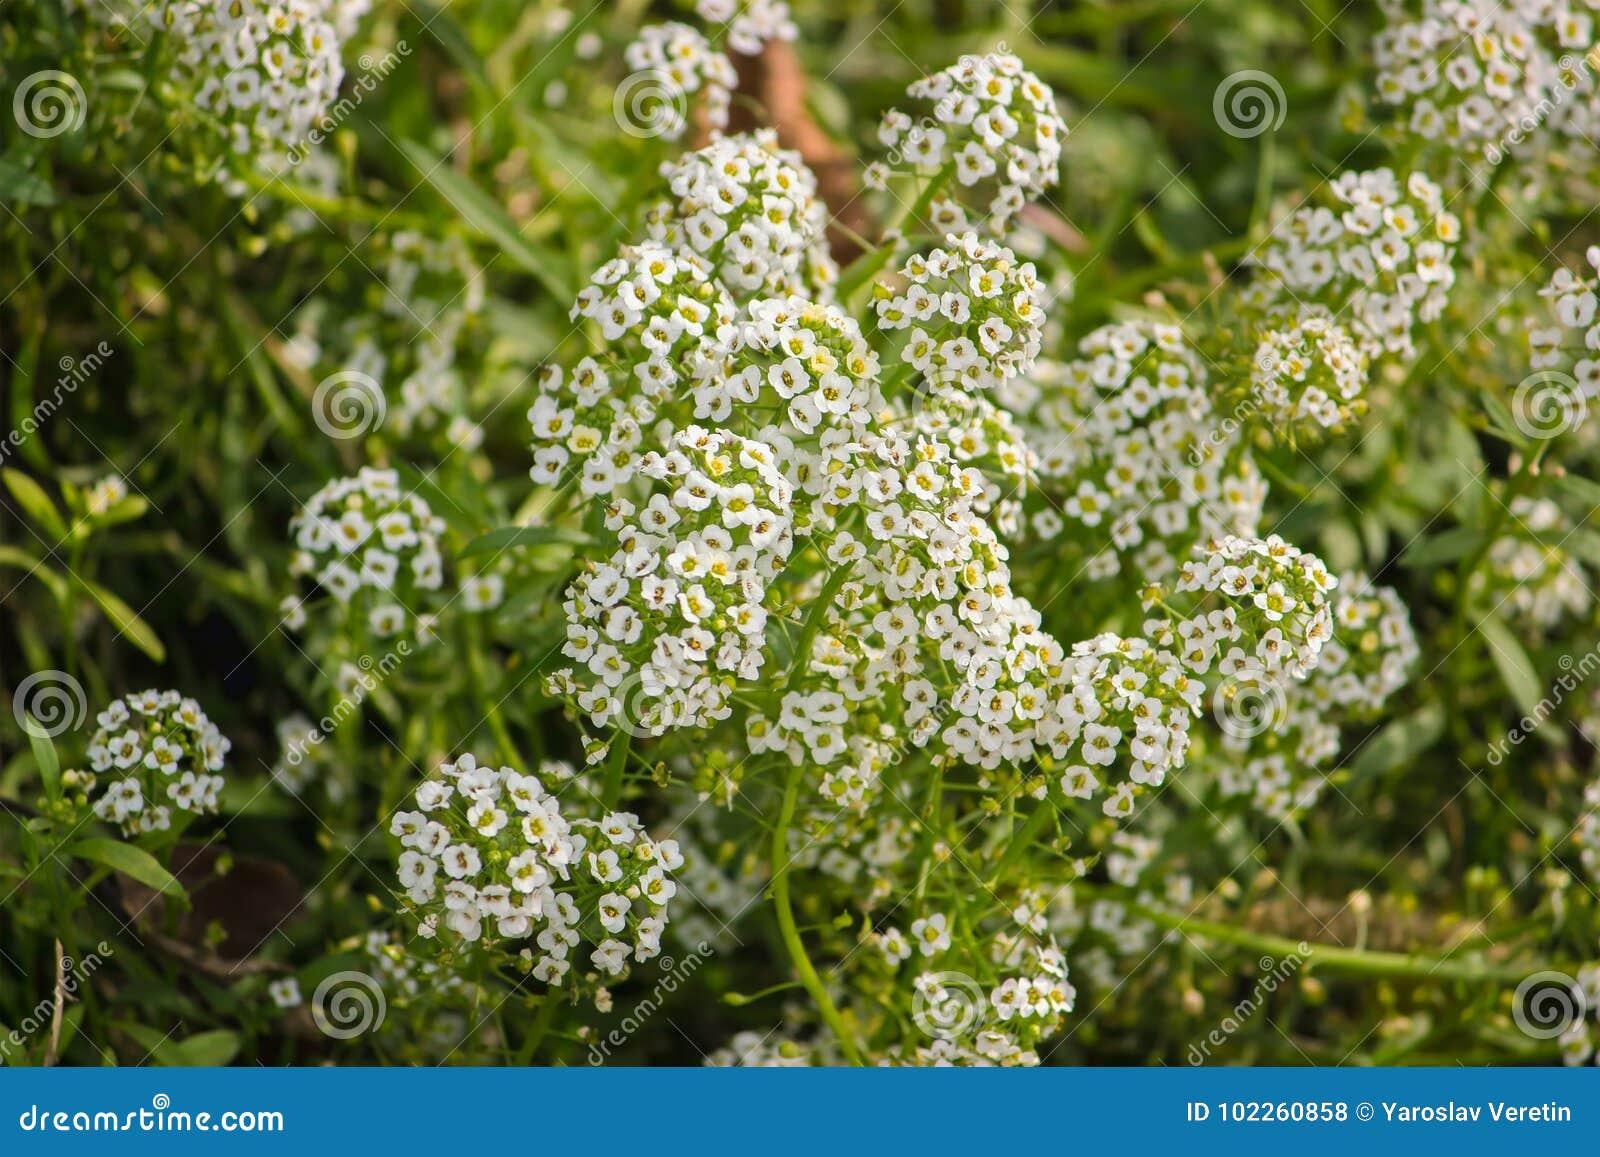 Tiny White Flower Bush In The Garden Stock Photo Image Of Details